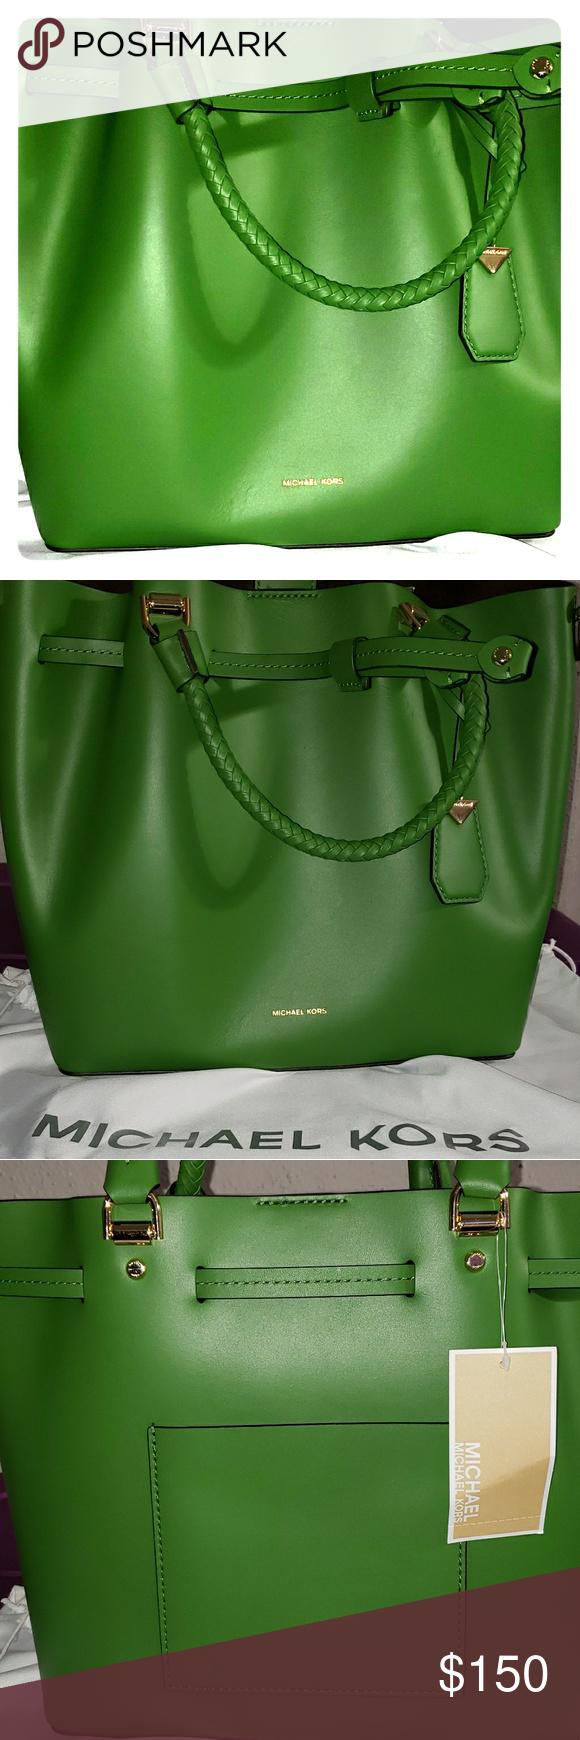 74d46dca56b7 Michael Kors Blakely Leather Bucket Bag True Green